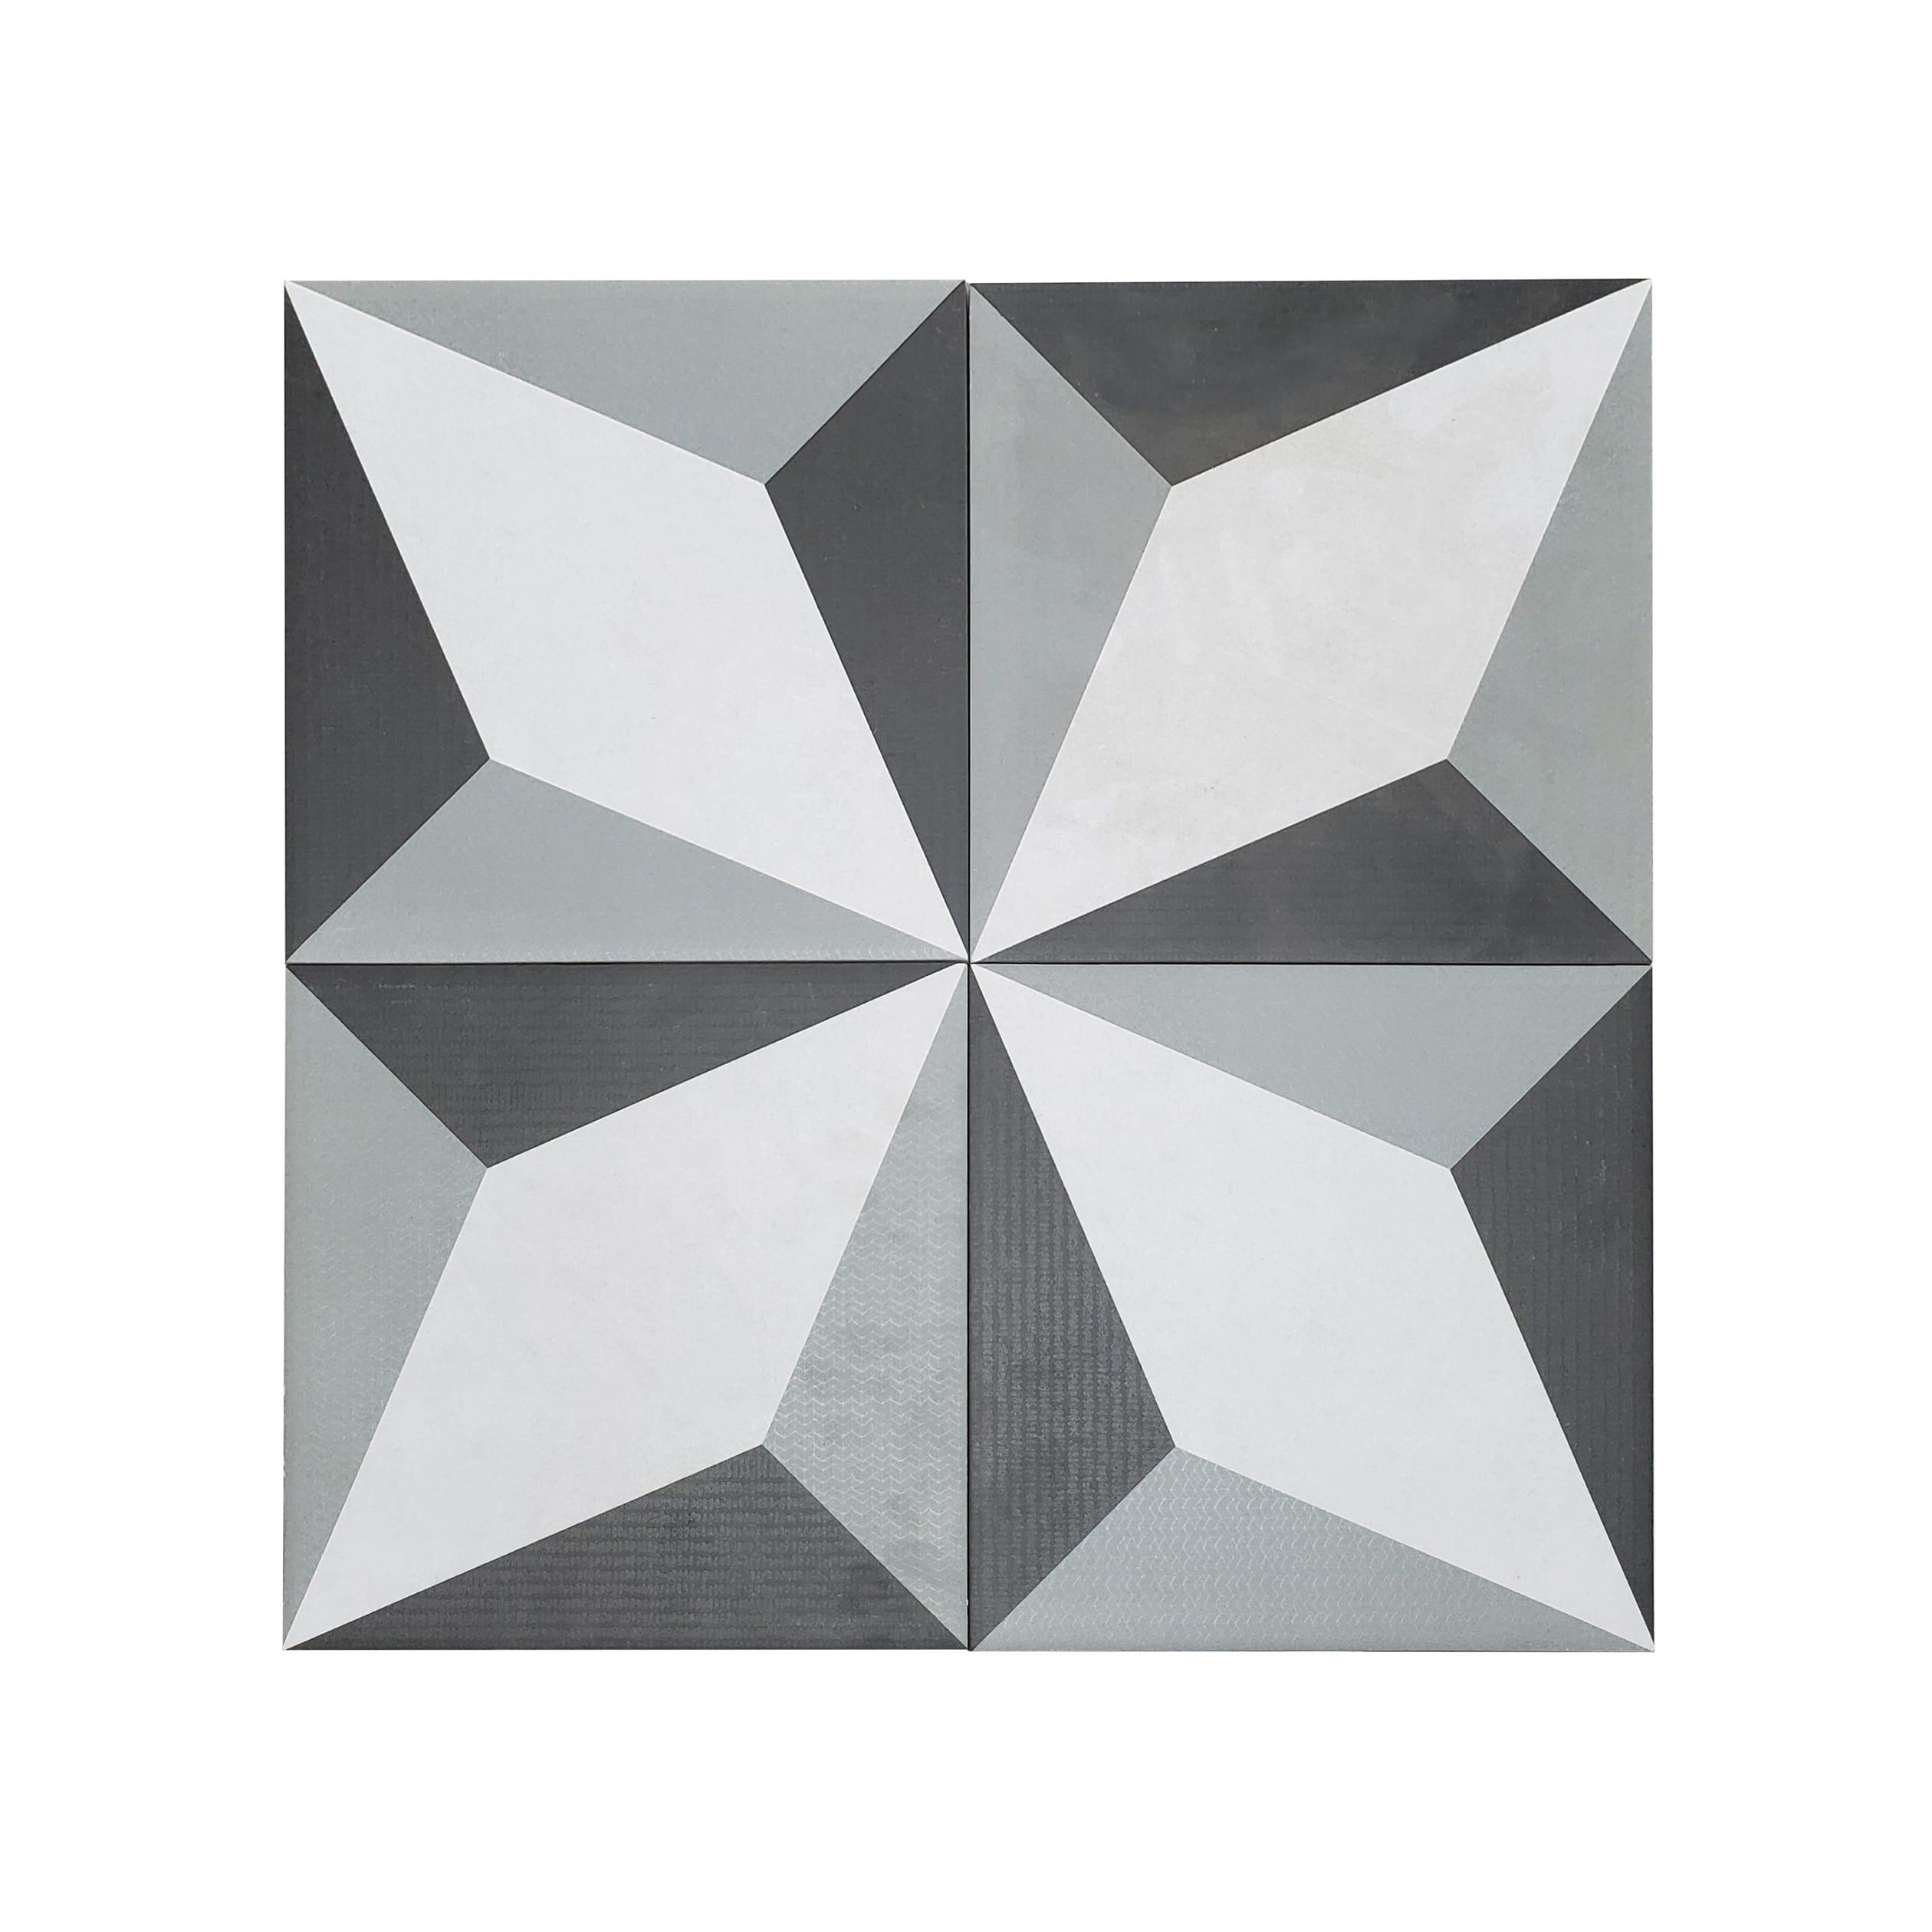 8×8 Decor Forma Matte_Made in Spain_Black-3.99